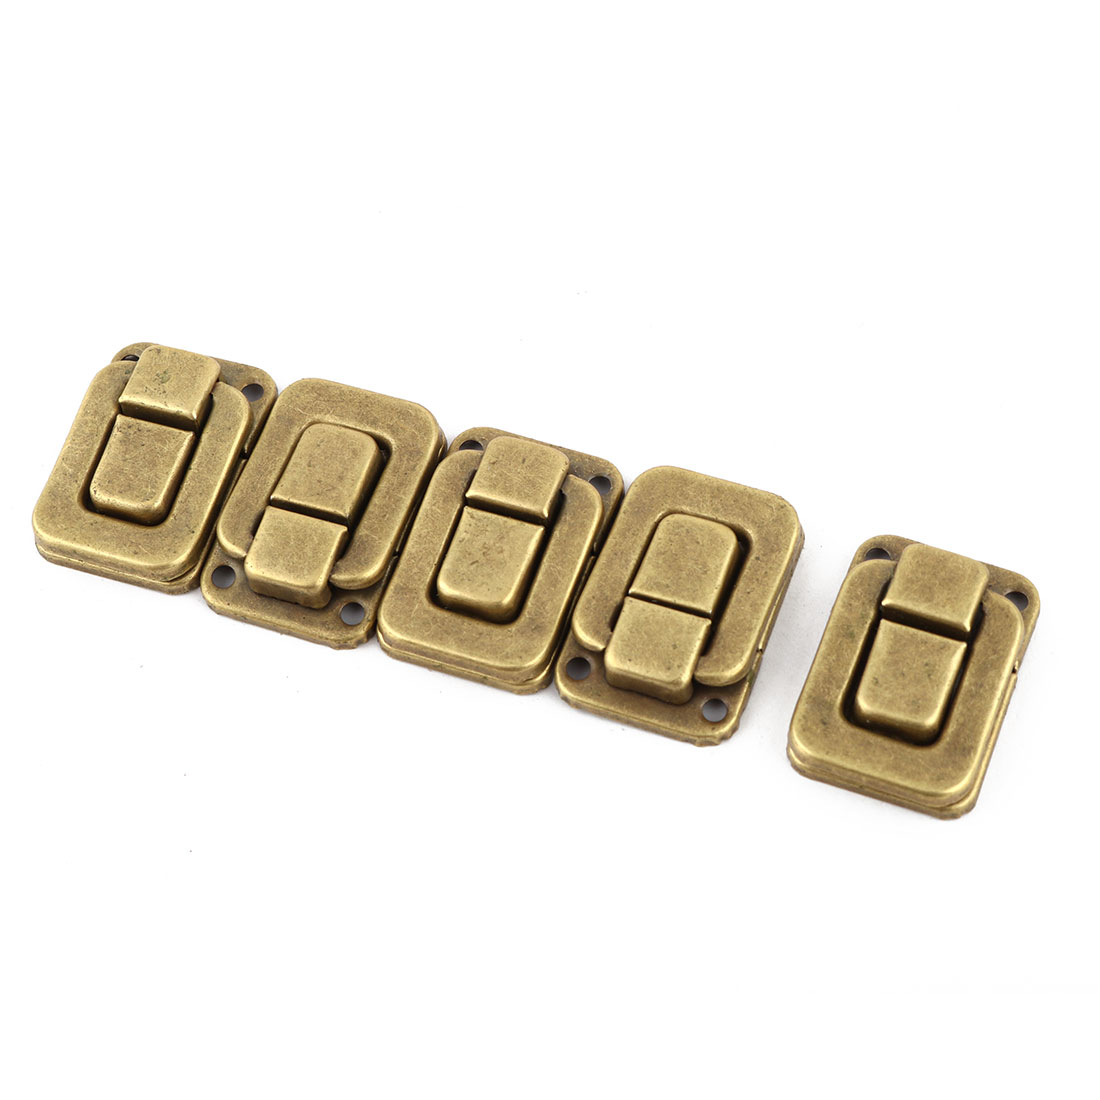 Household Metal Suitcase Lock Hook Hinge Toggle Box Latch Hasp Brass Tone 5 Pcs - image 4 of 4